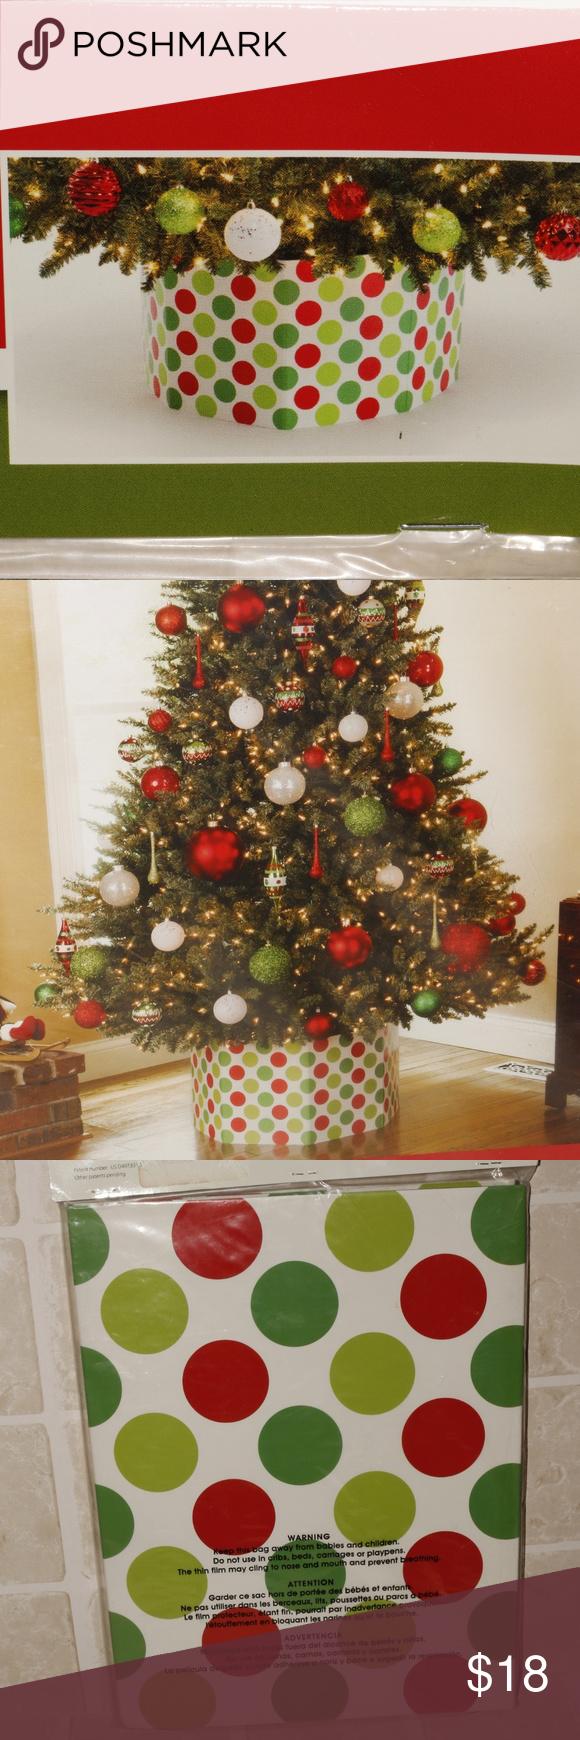 StandUP Christmas Tree Skirt Polka Dot StandUP Tree skirt Red & green polka dot on a white base ...